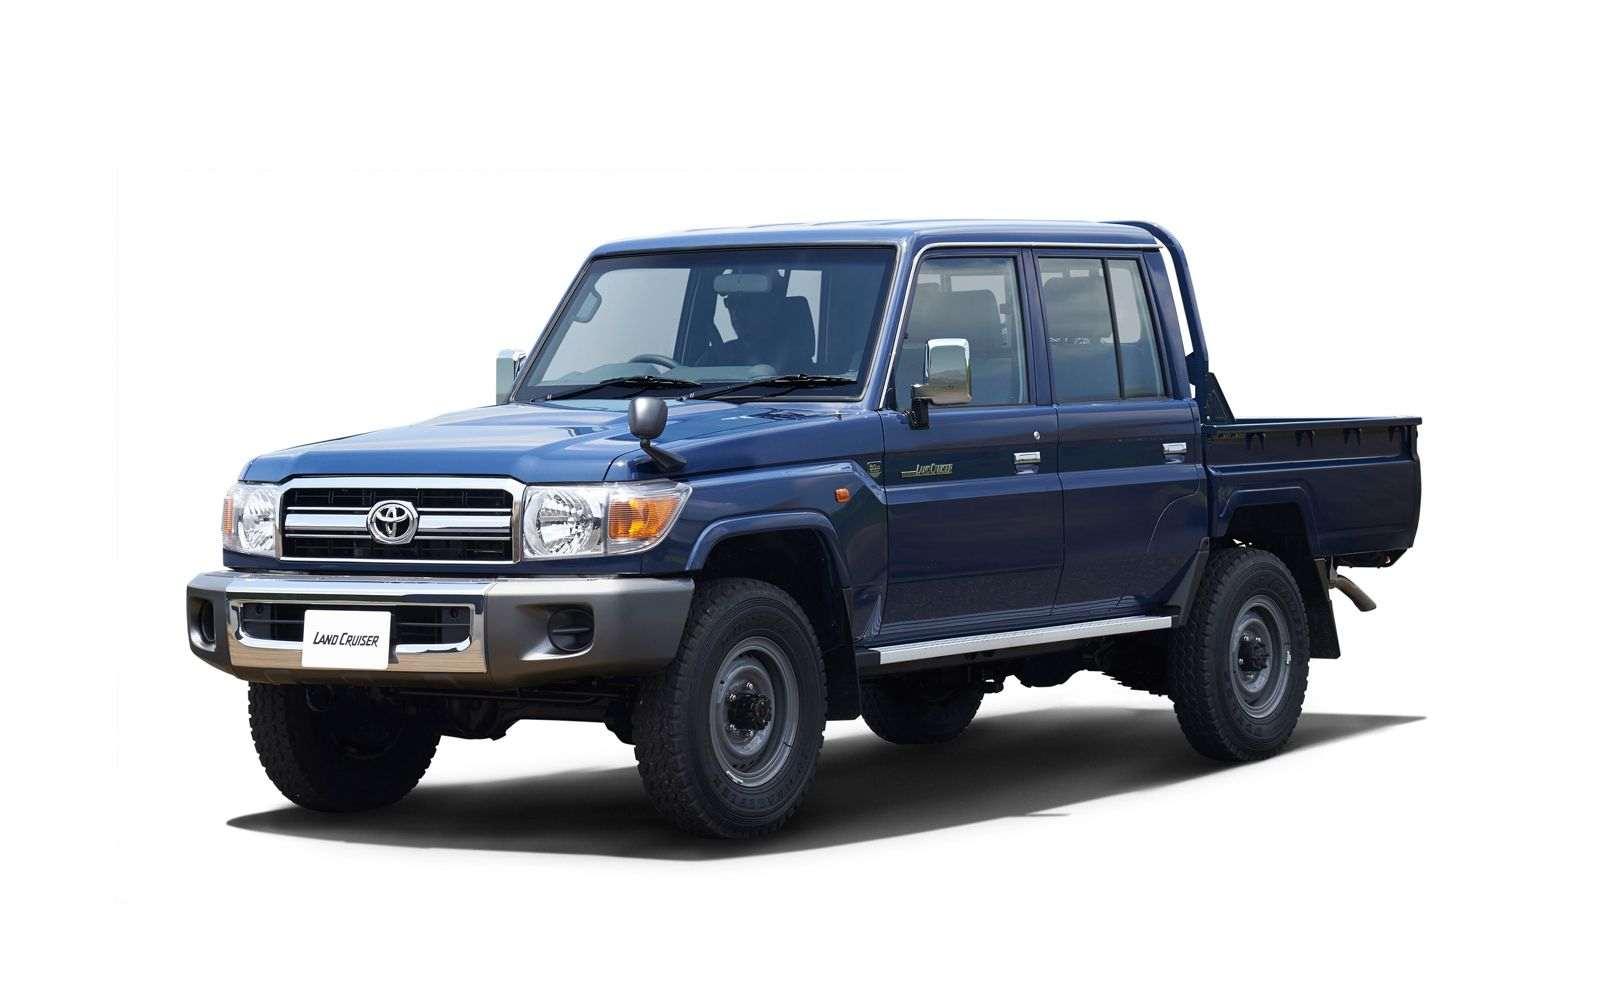 Toyota-Land-Cruiser-70-Series-23